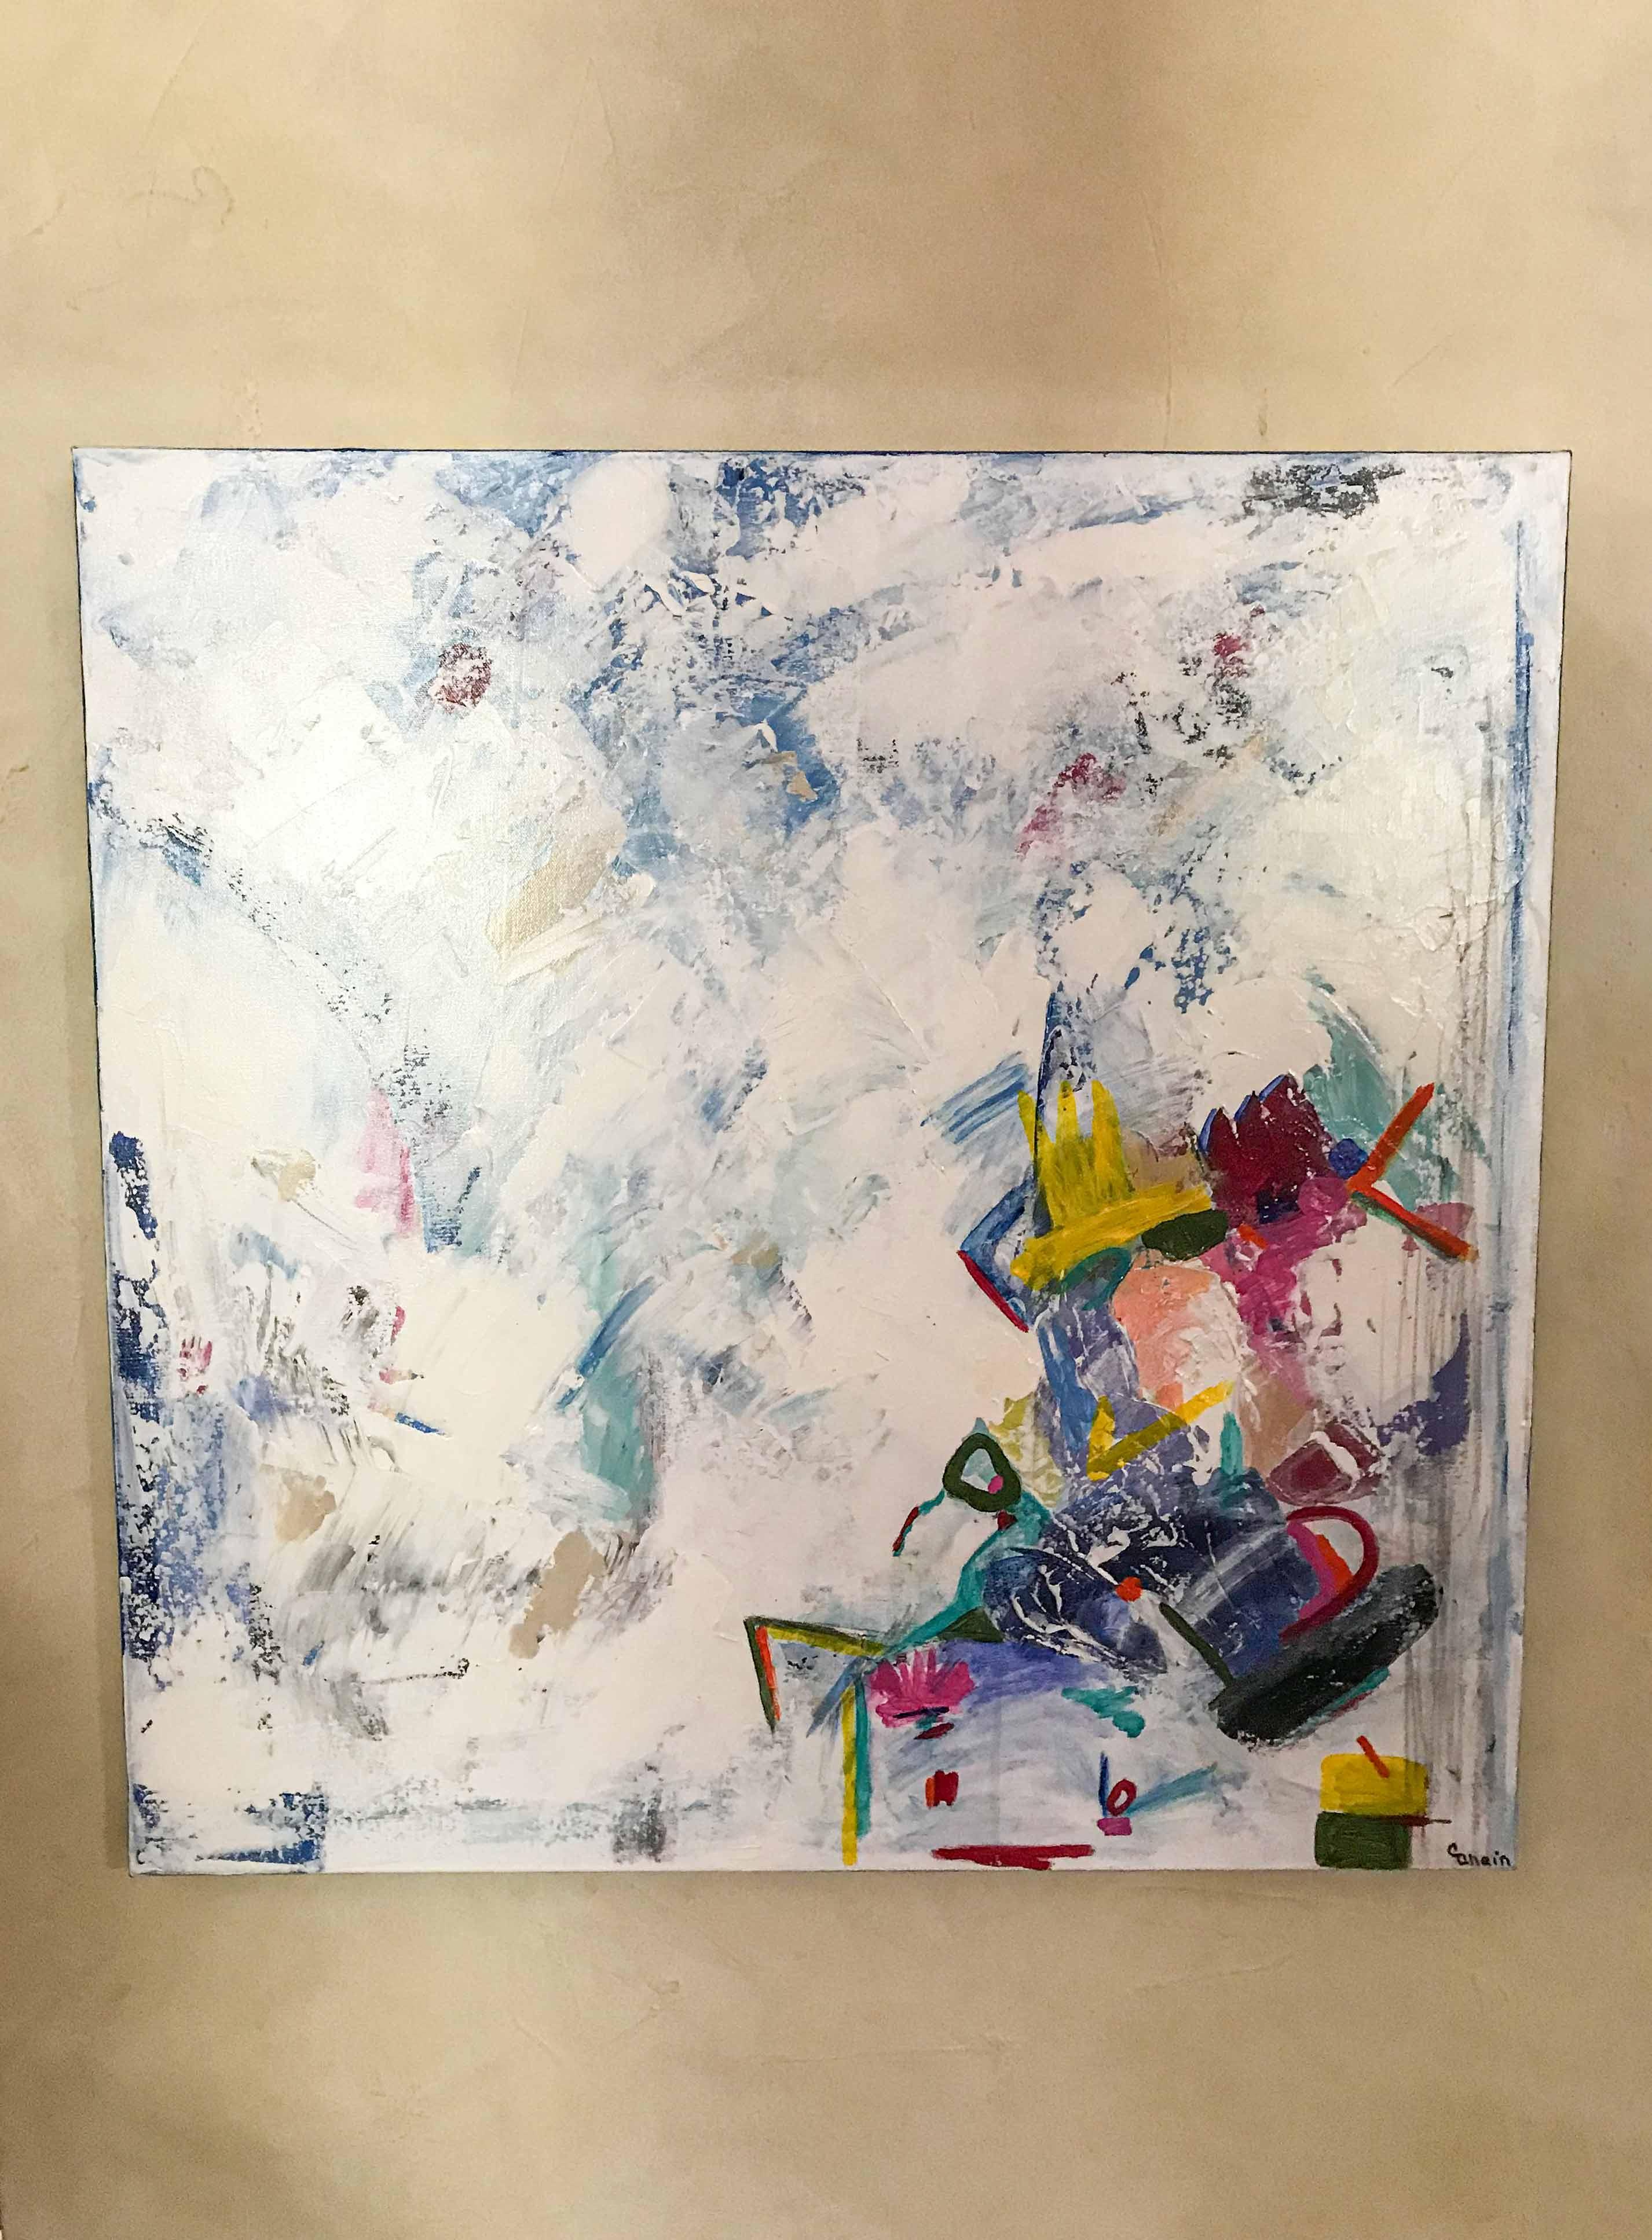 White Out | 30x30 | Christa Chain Art